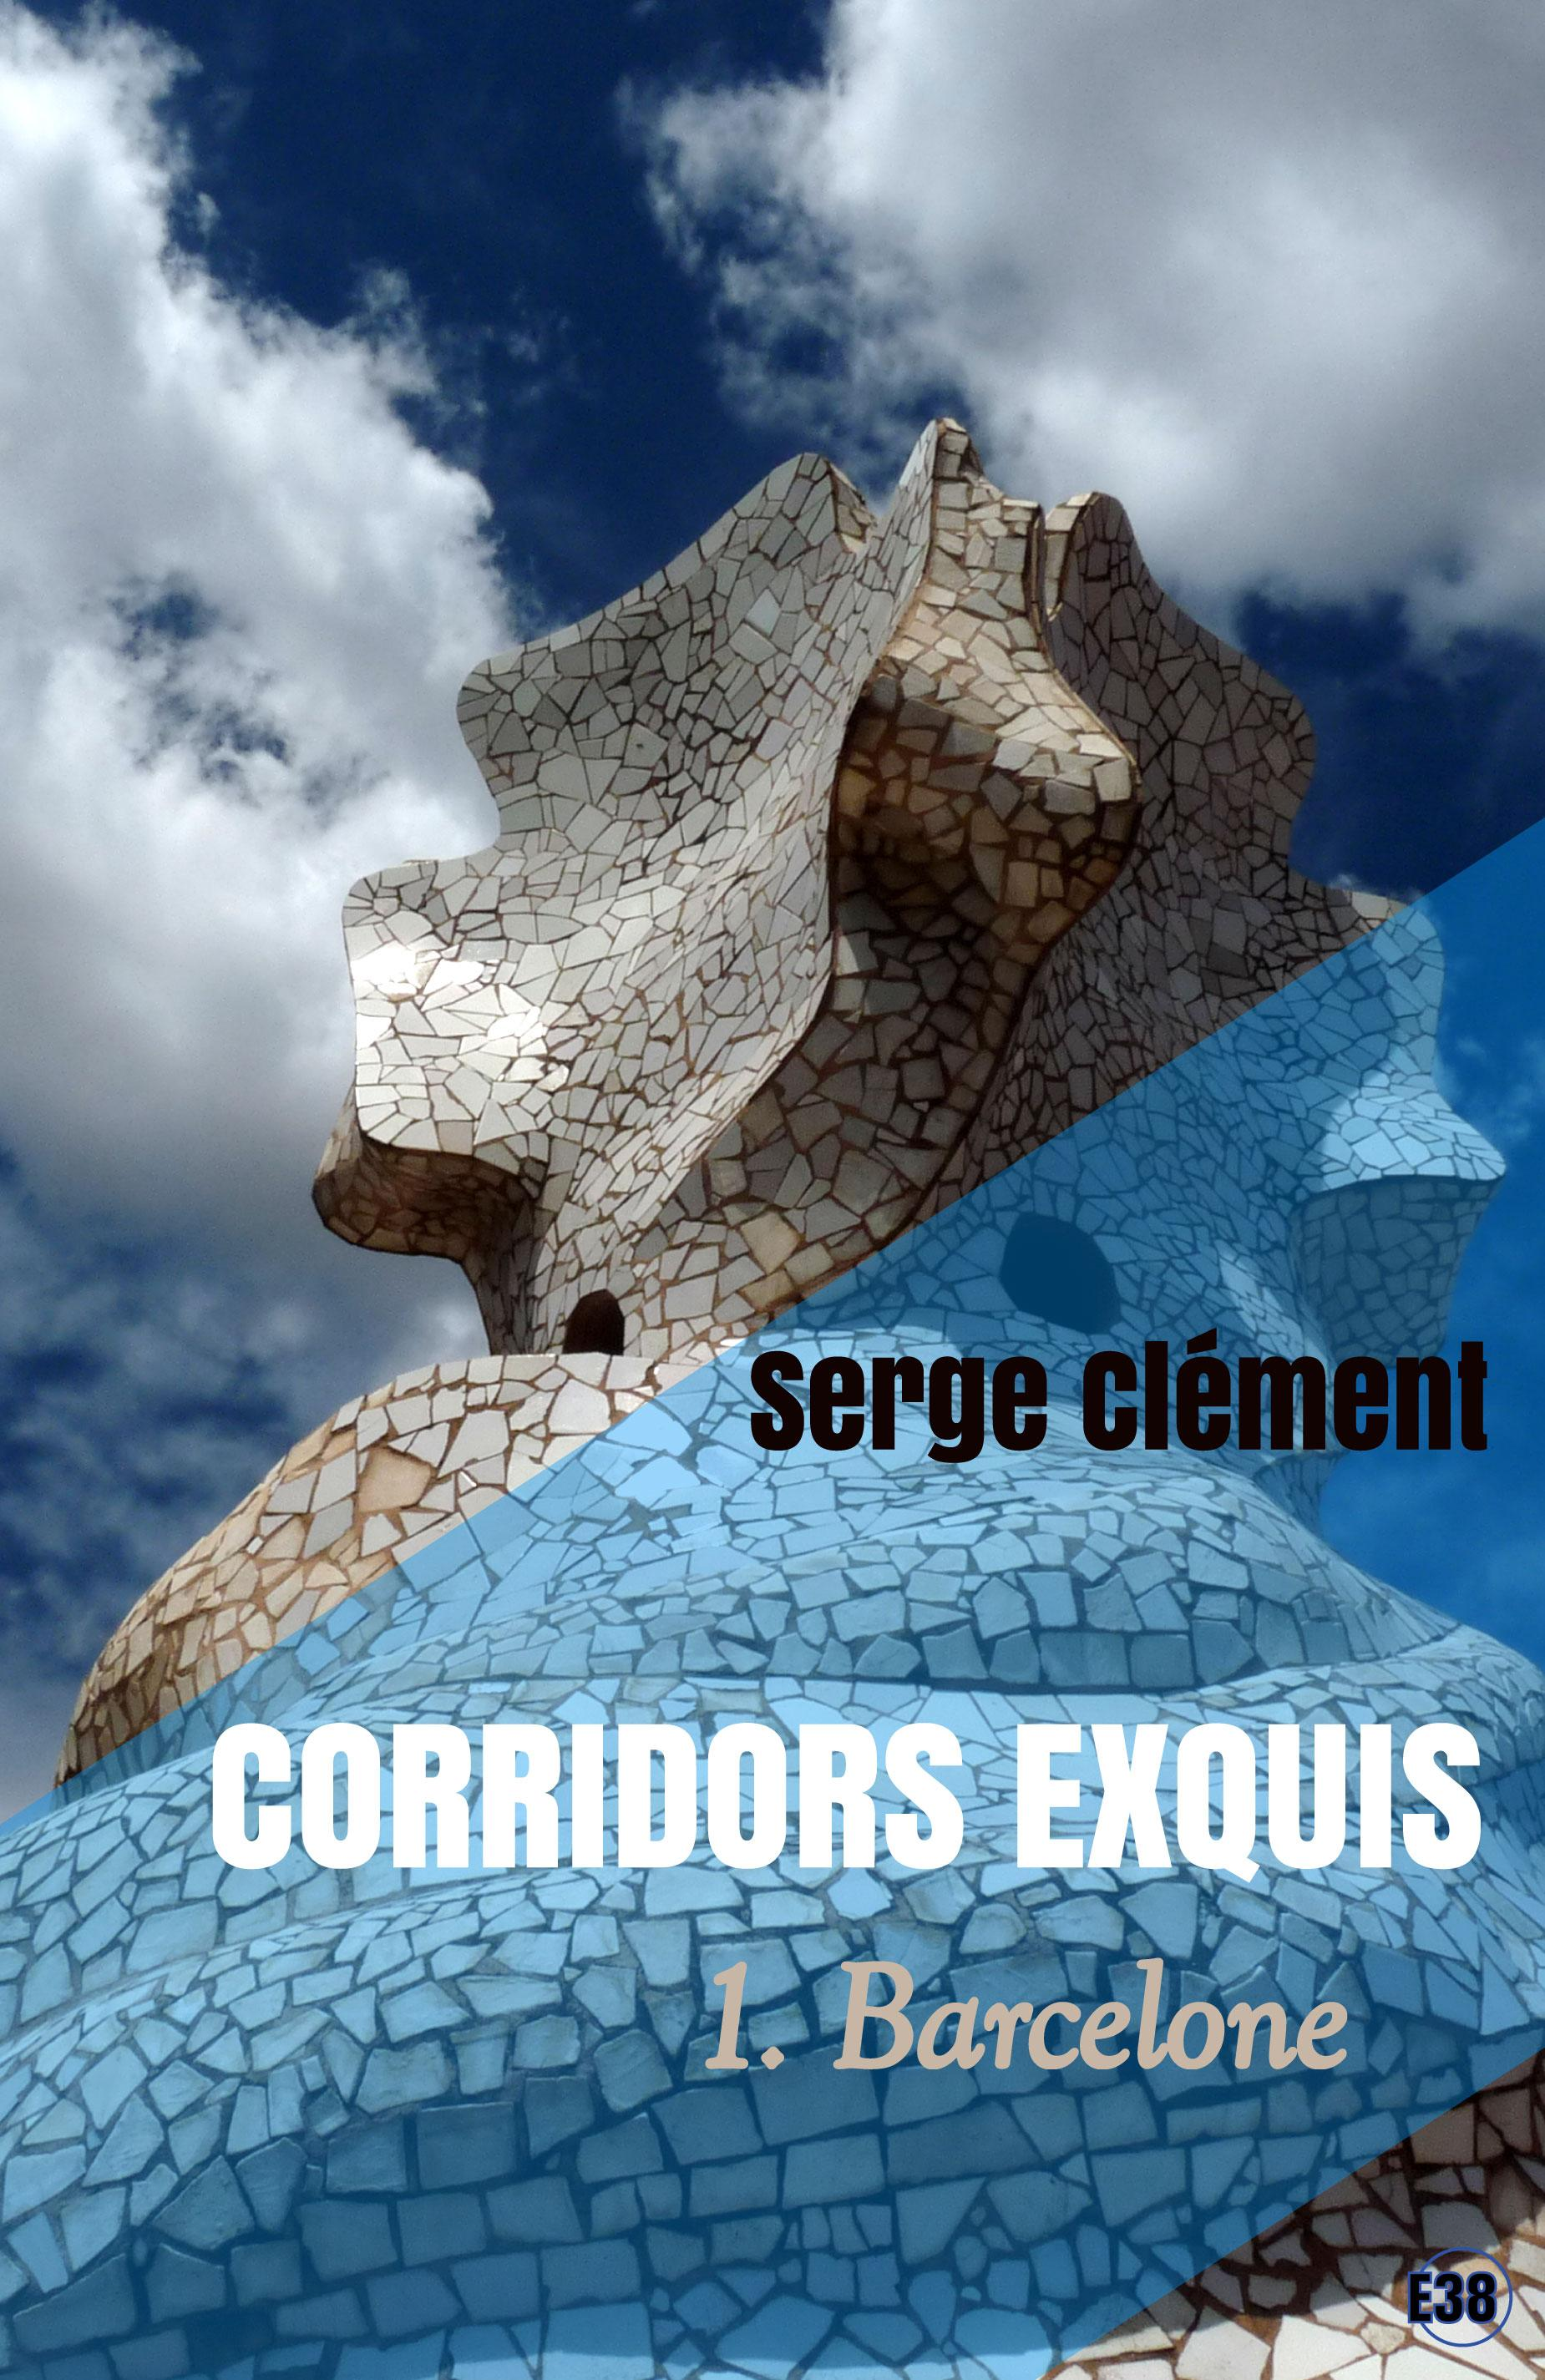 Corridors exquis 1, Barcelone